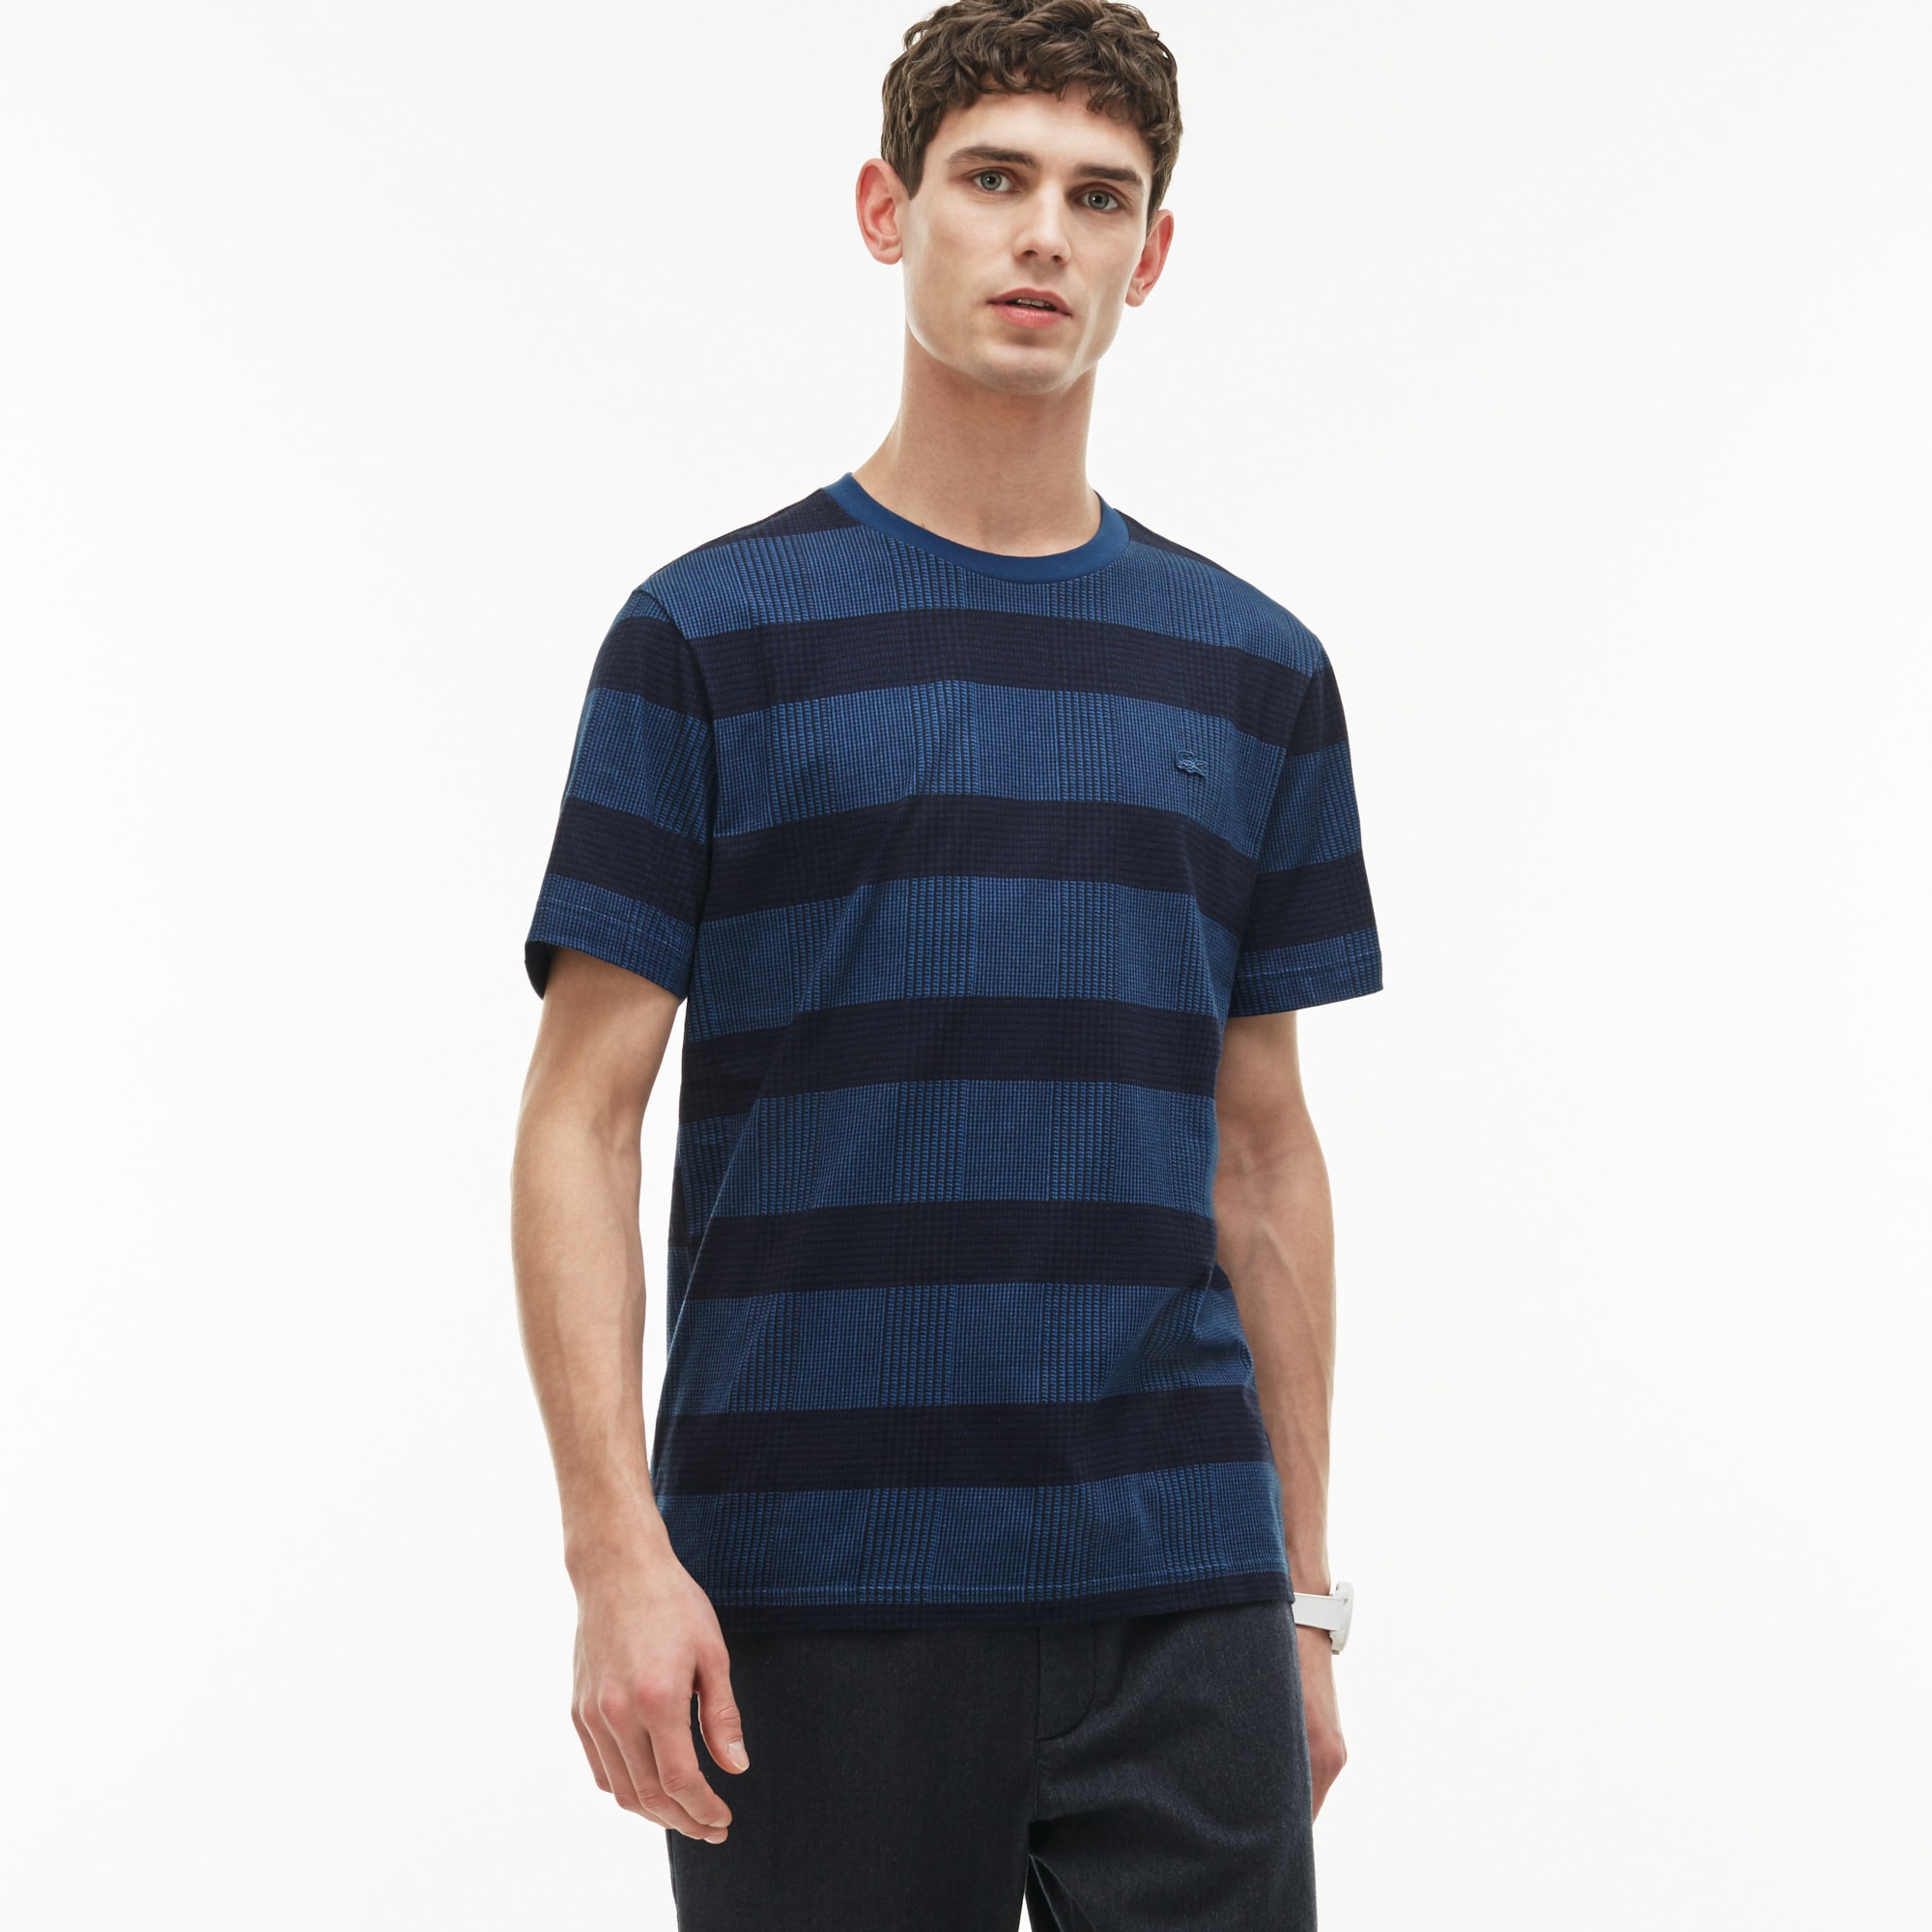 Men's Crew Neck Glen Plaid Jersey T-shirt